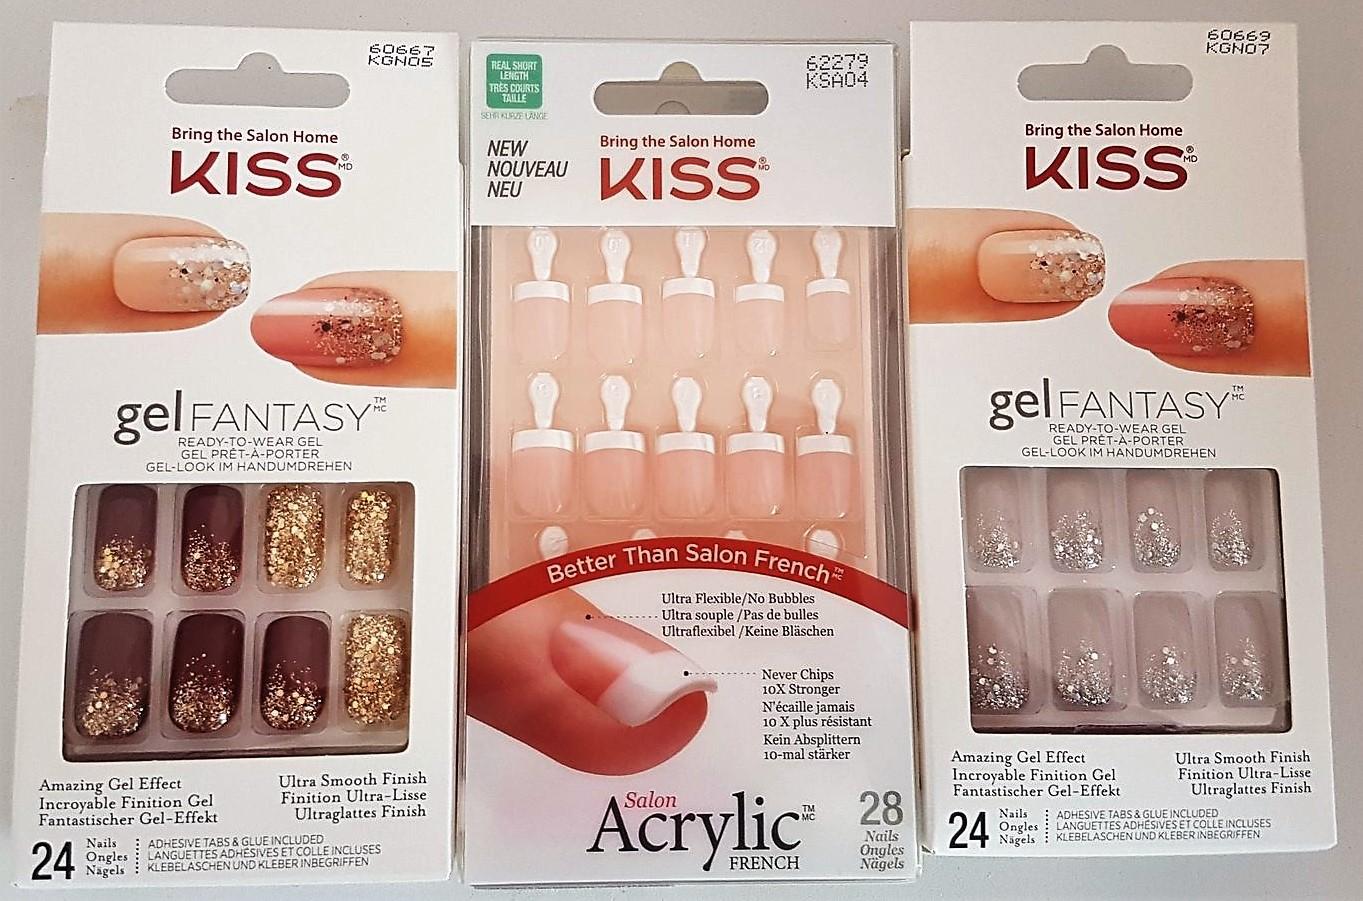 is kiss nail glue good for acrylic nails photo - 2